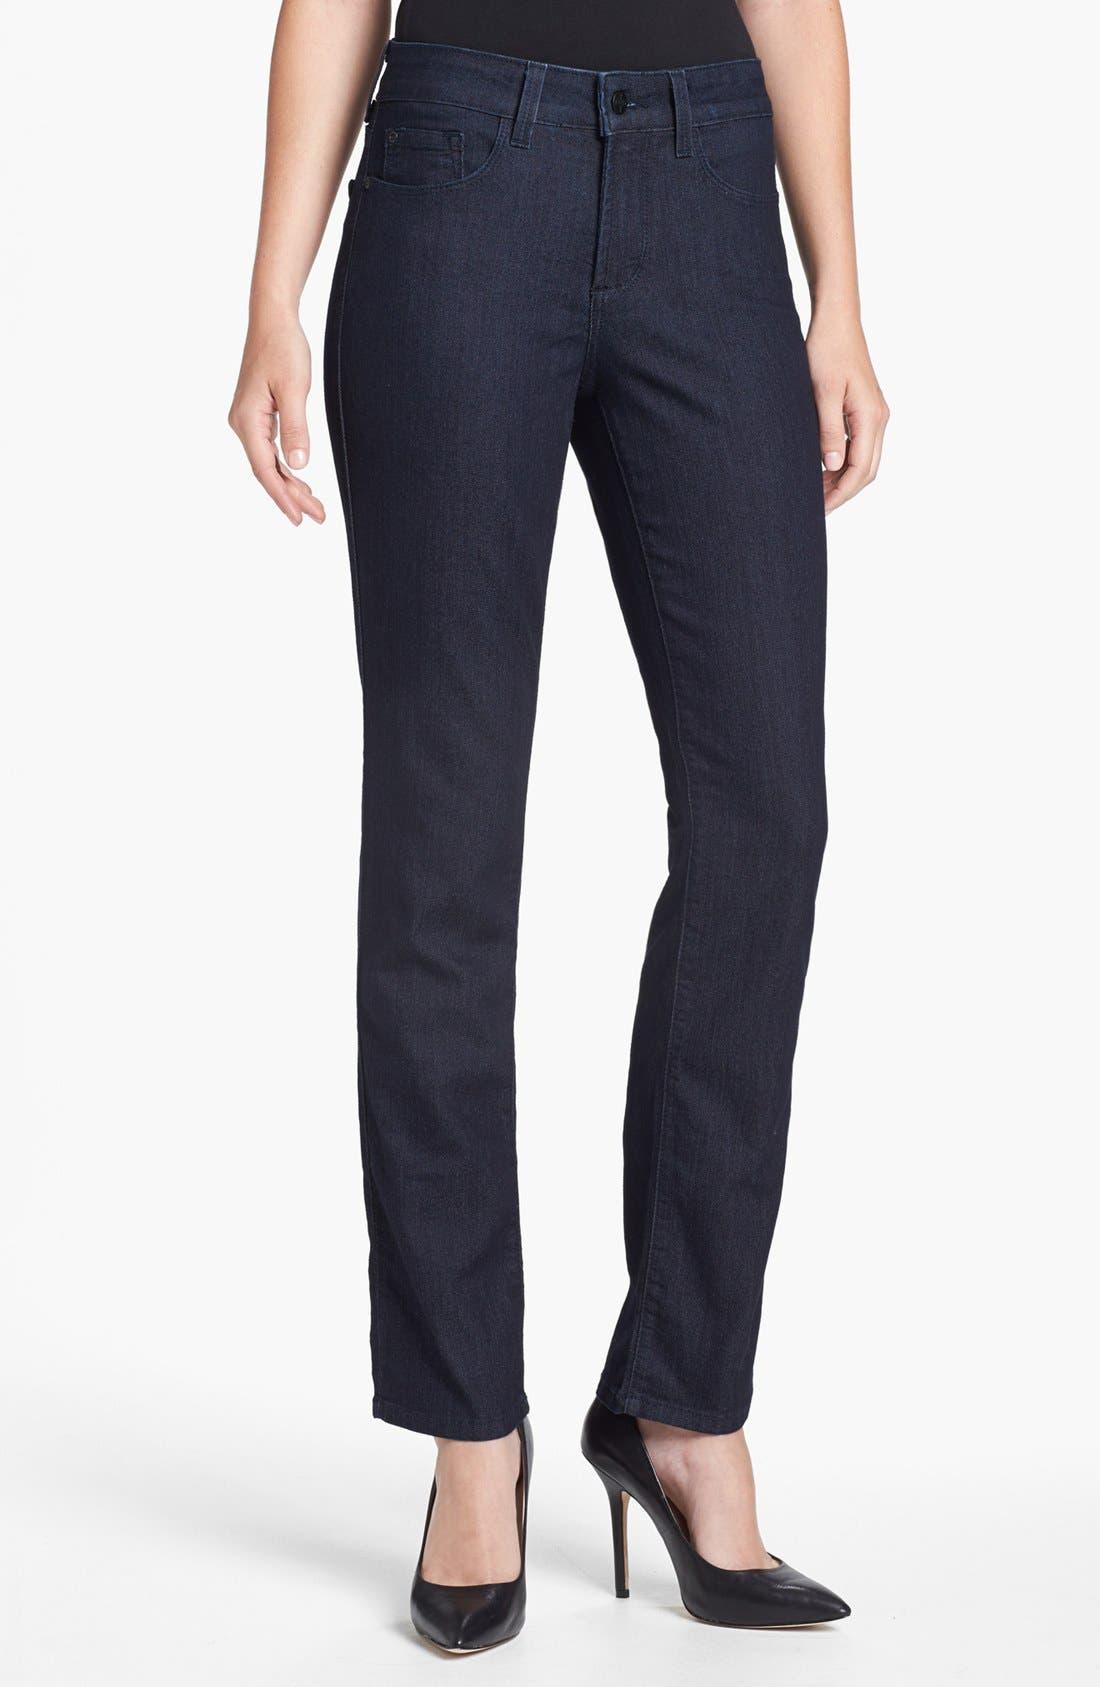 Main Image - NYDJ 'Sheri' Stretch Skinny Jeans (Dark Enzyme)